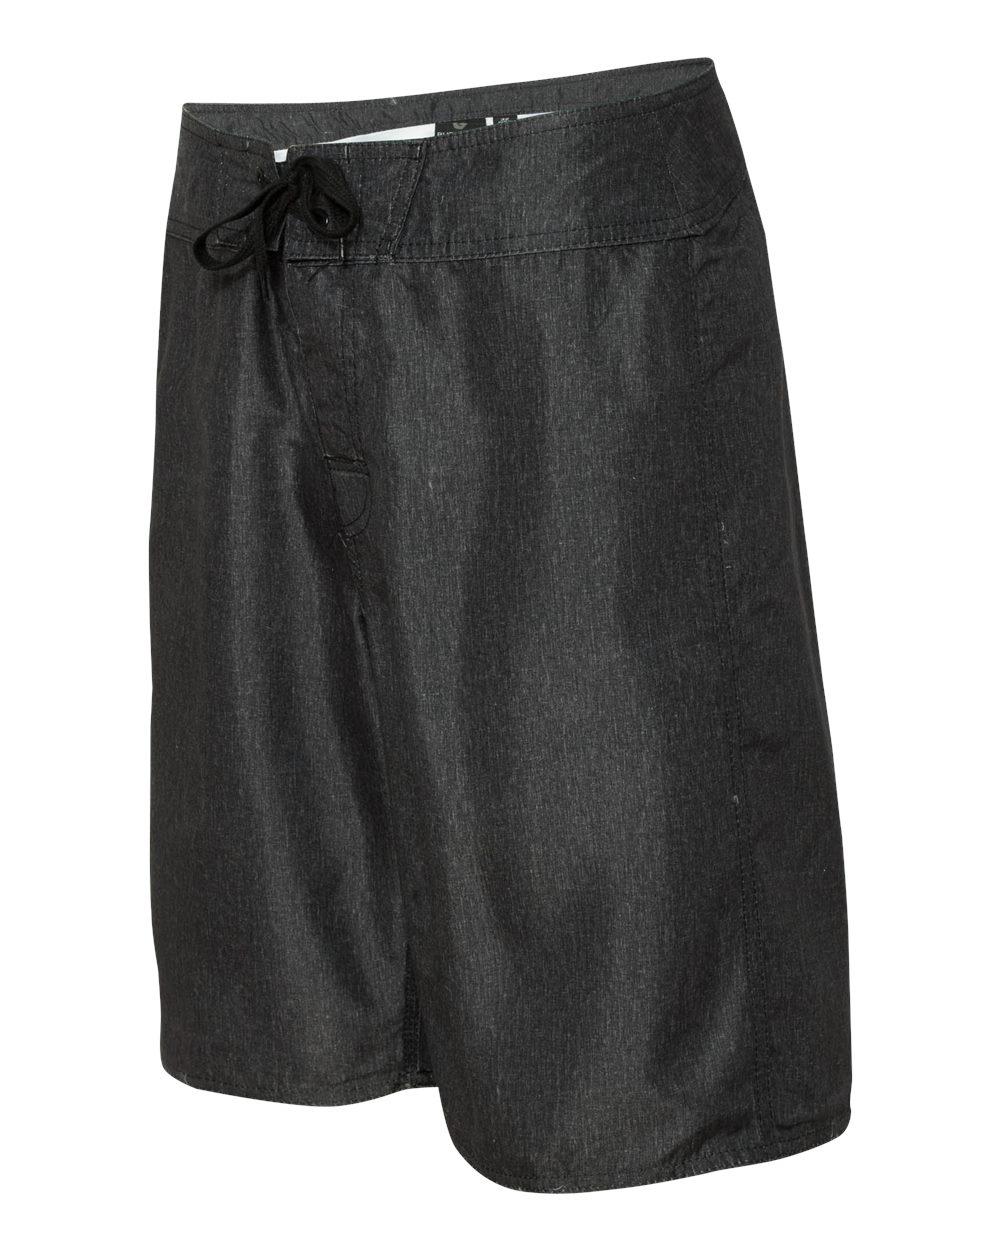 Burnside-Men-039-s-Heathered-Board-Shorts-B9305-30-40 thumbnail 6